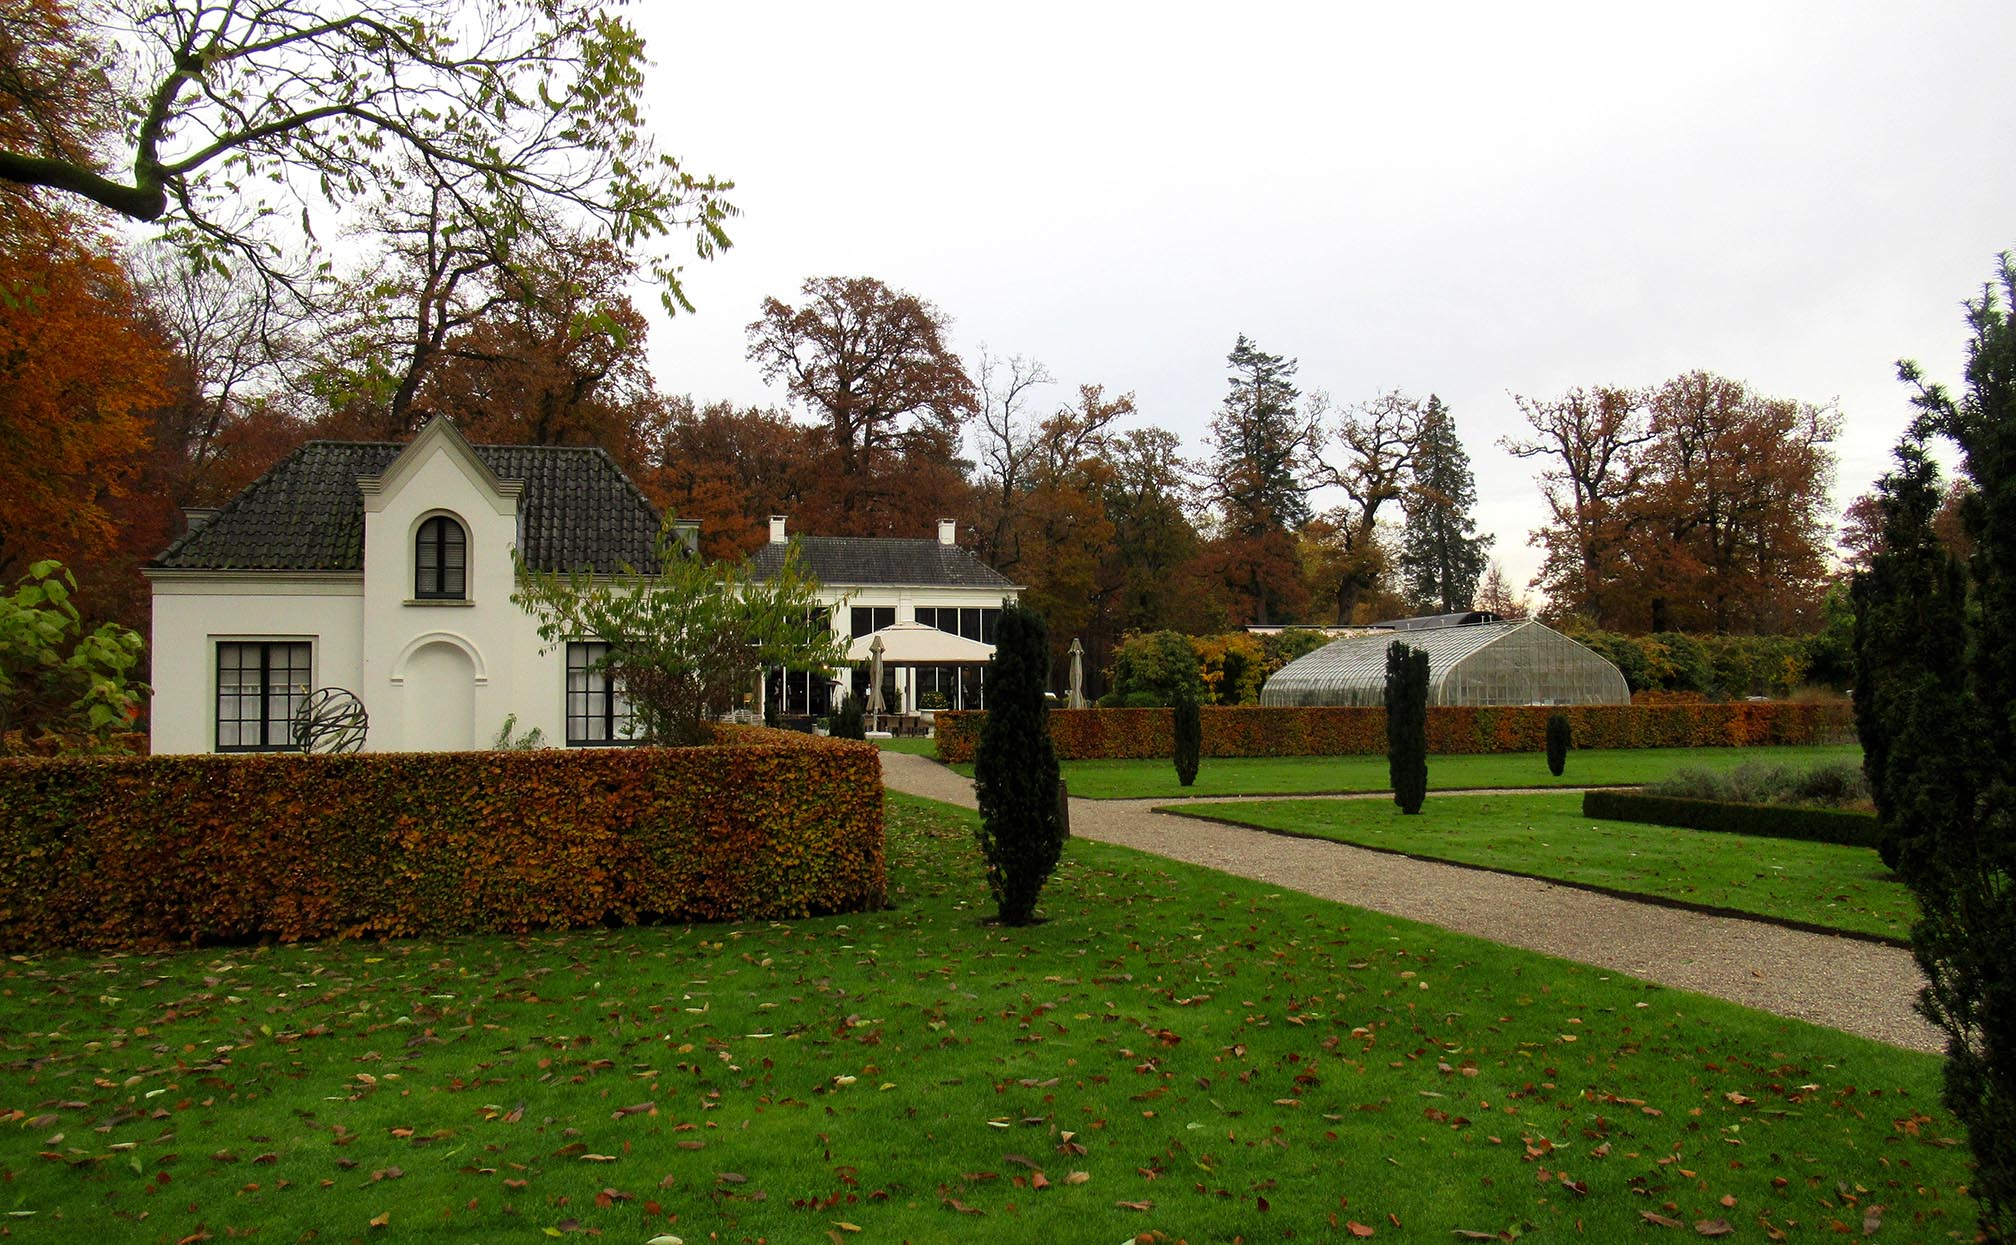 De tuinmanswoning, Orangerie en een kas in de kasteeltuin – Foto: ©Louis Fraanje